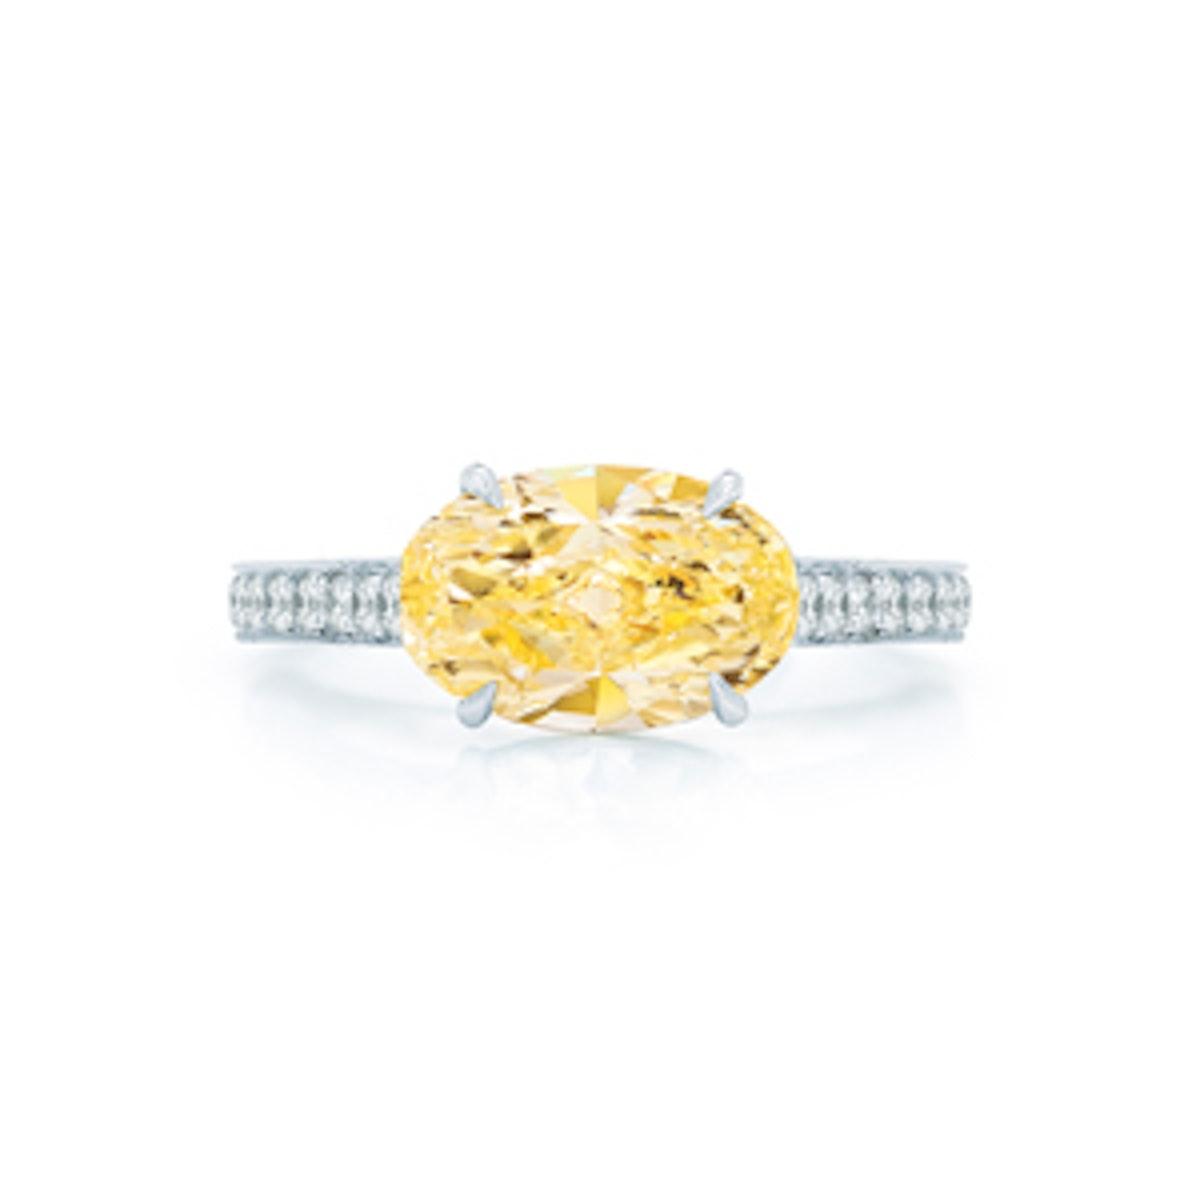 Oval Yellow Diamond Engagement Ring